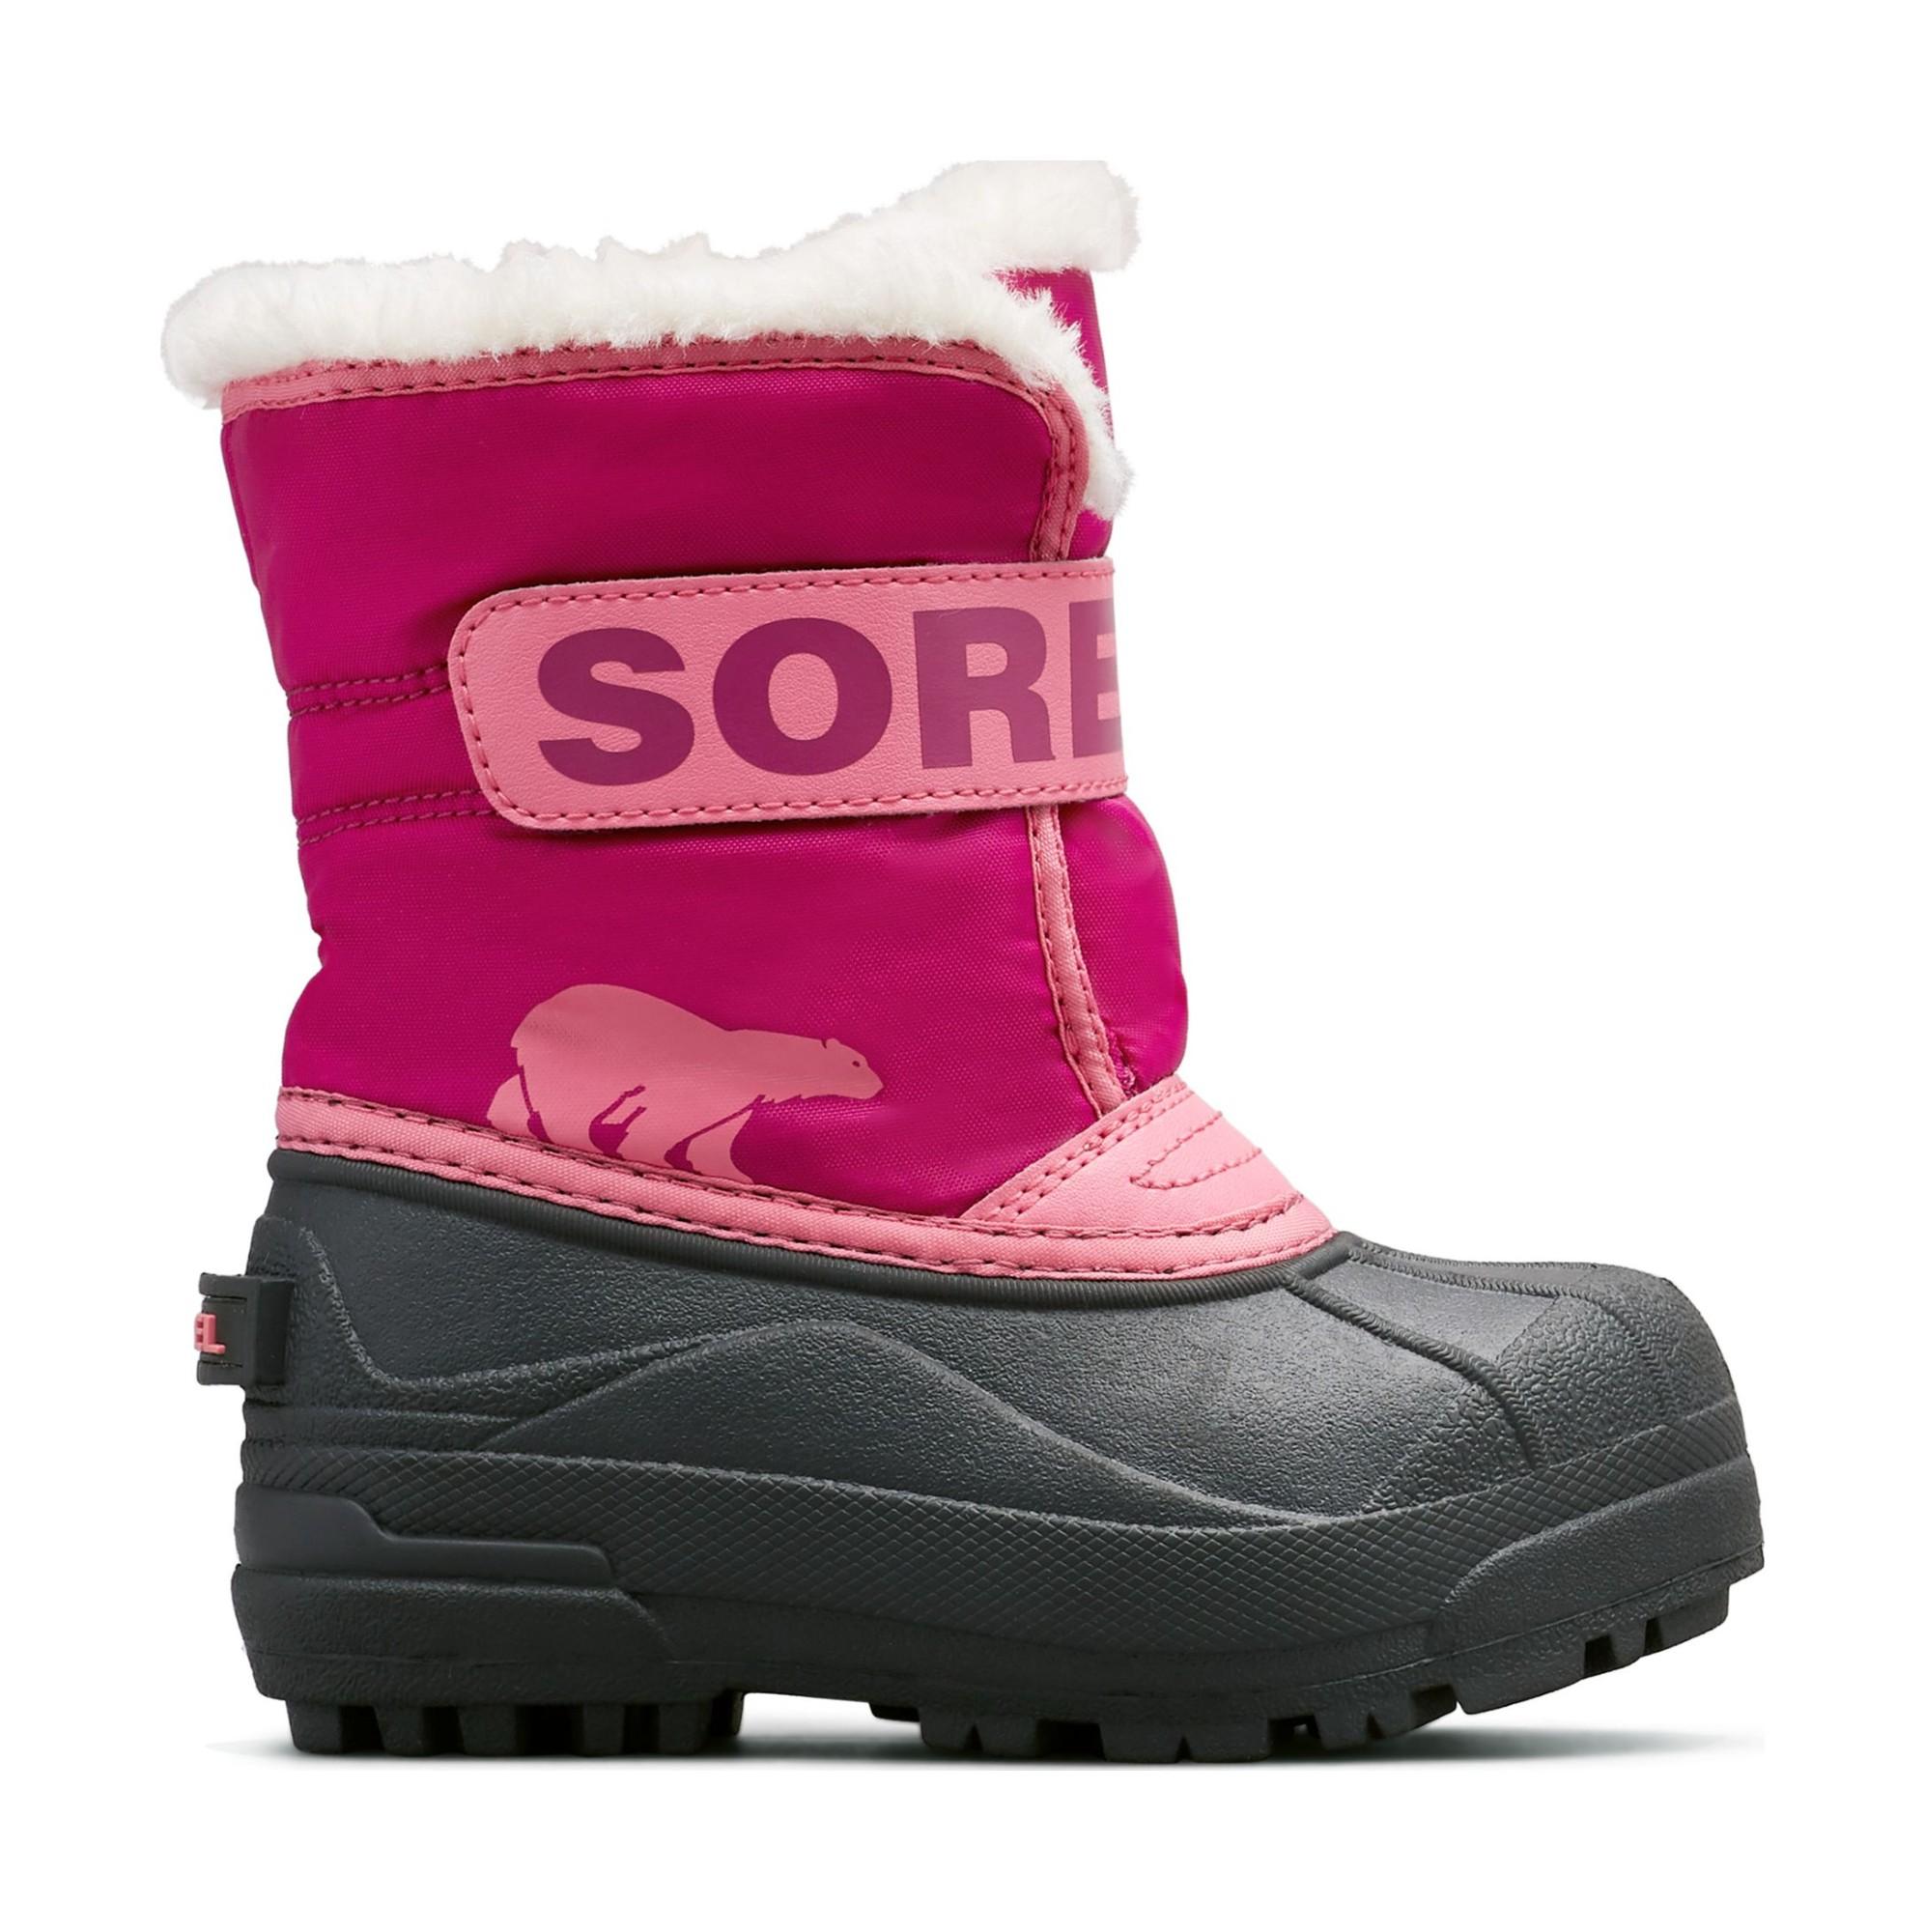 Sorel Snow Commander Kid's Tropic Pink/Deep Blush 29